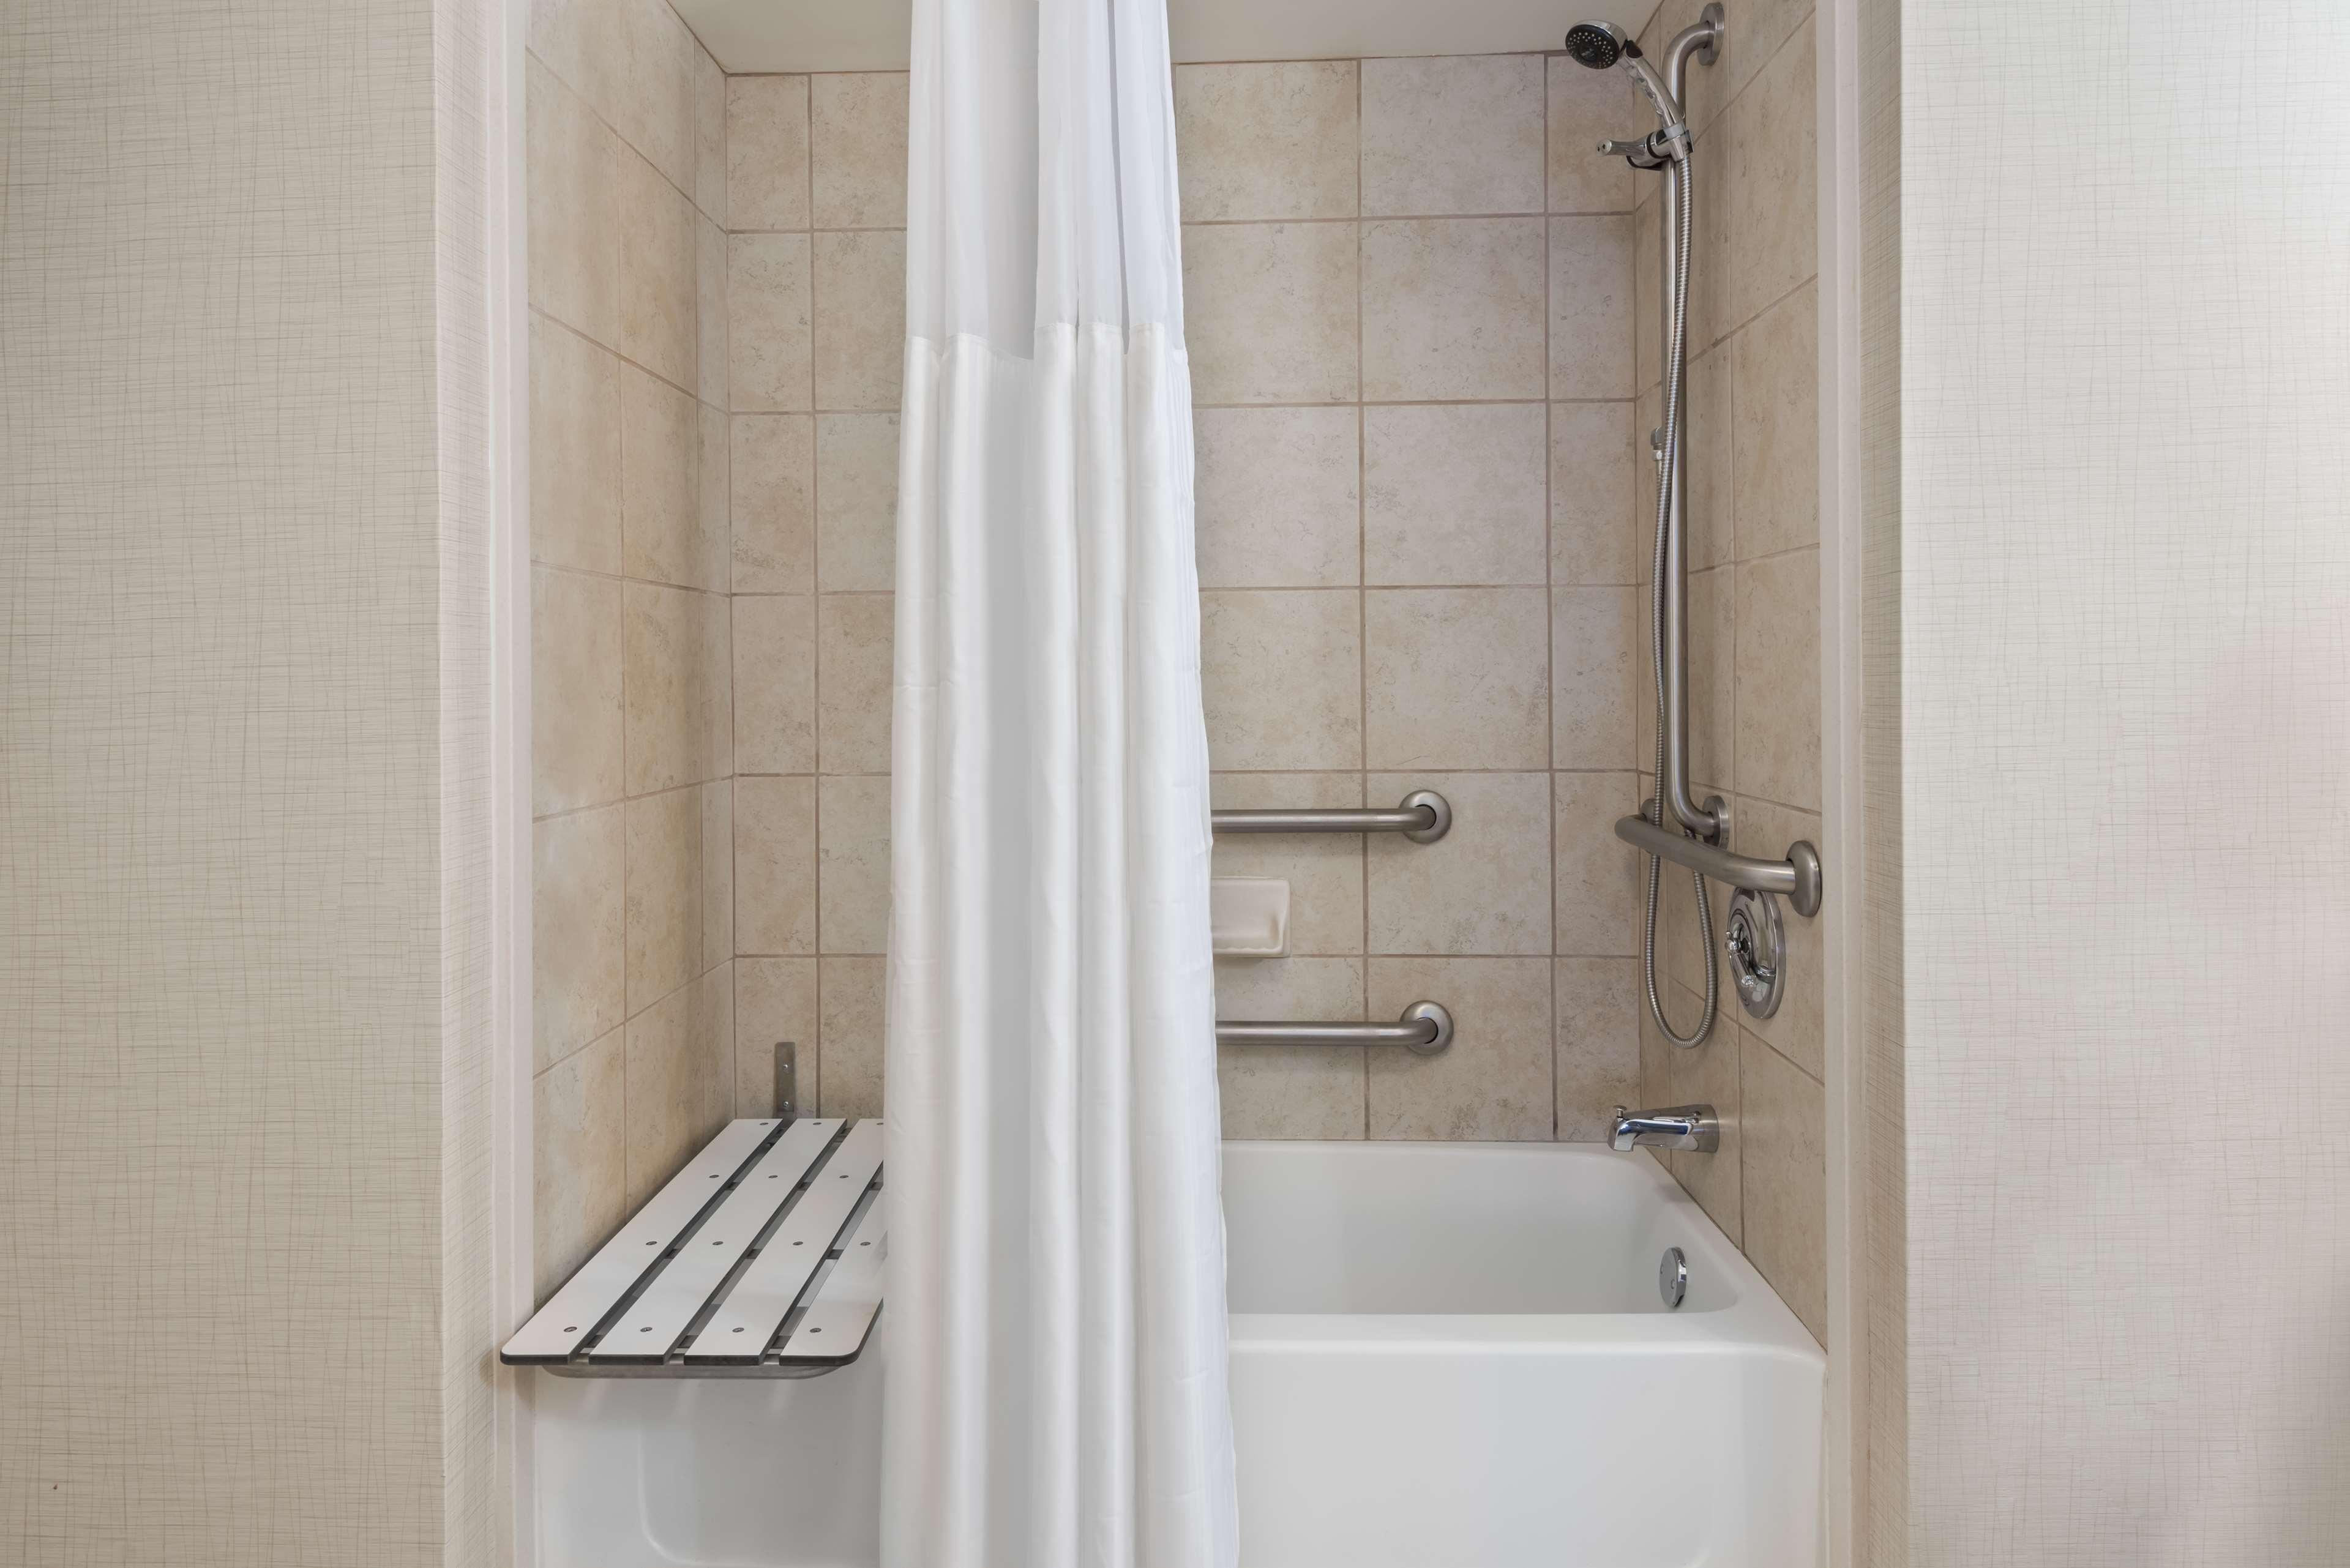 Homewood Suites by Hilton Holyoke-Springfield/North image 25